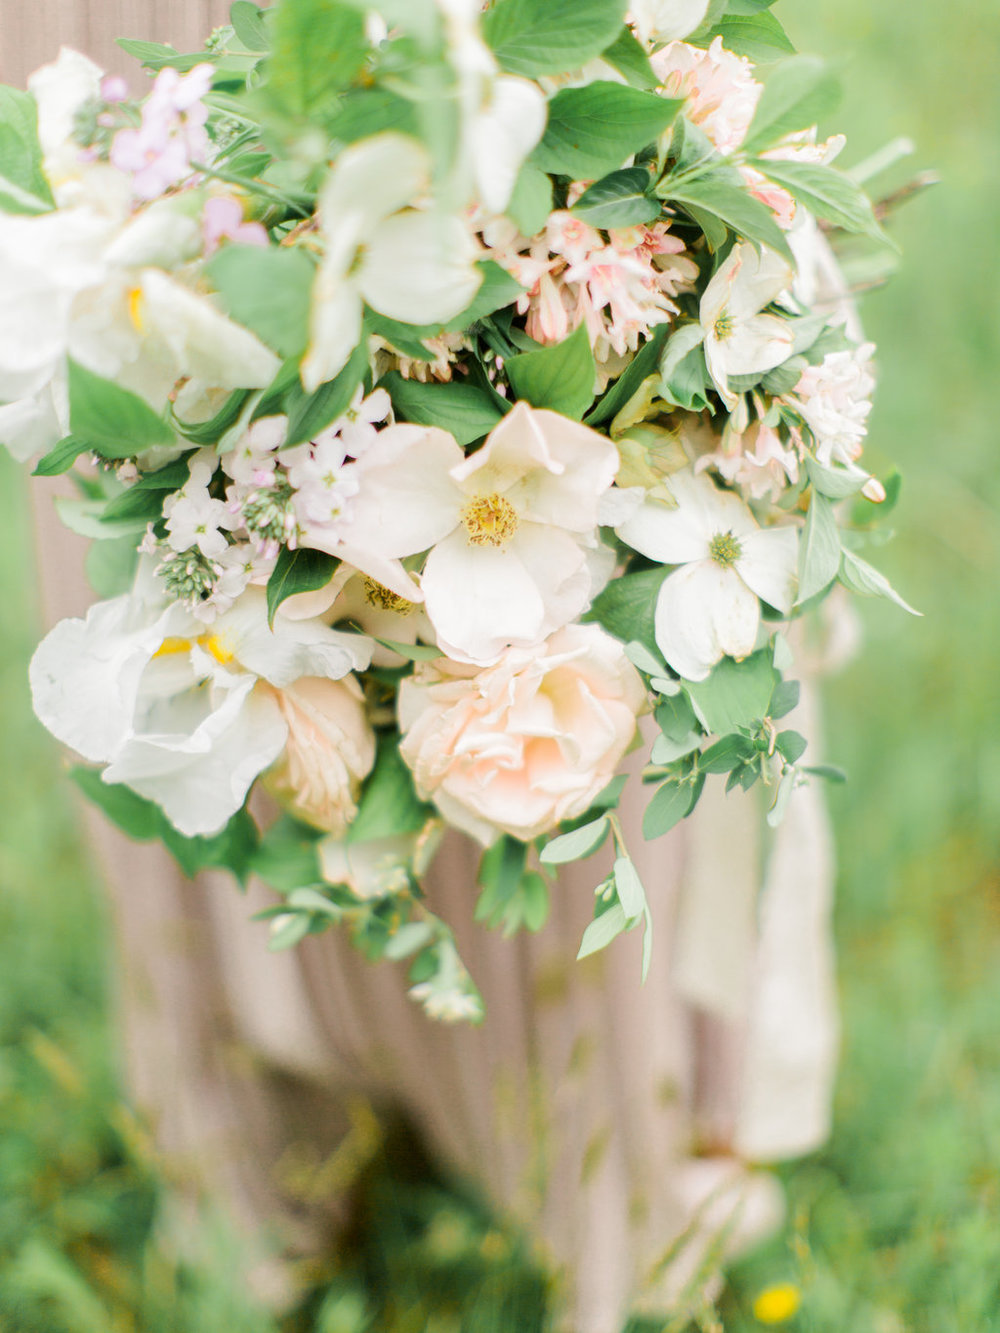 Rachel-May-Photography-5915-139.jpg